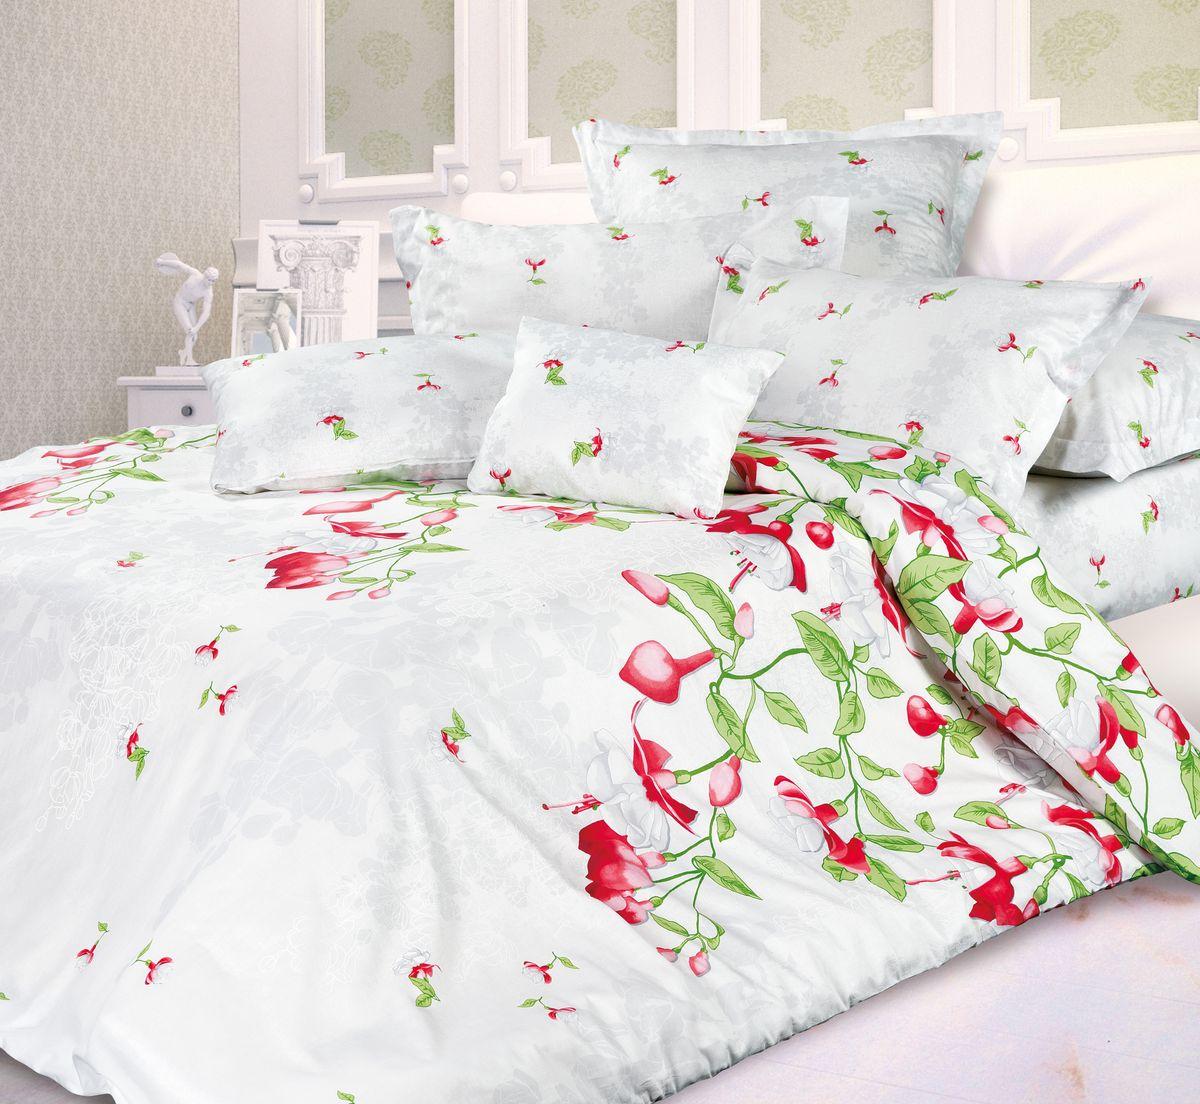 Комплект белья Унисон Фуксия, 1,5 спальное, наволочки 70 x 70. 339567339567